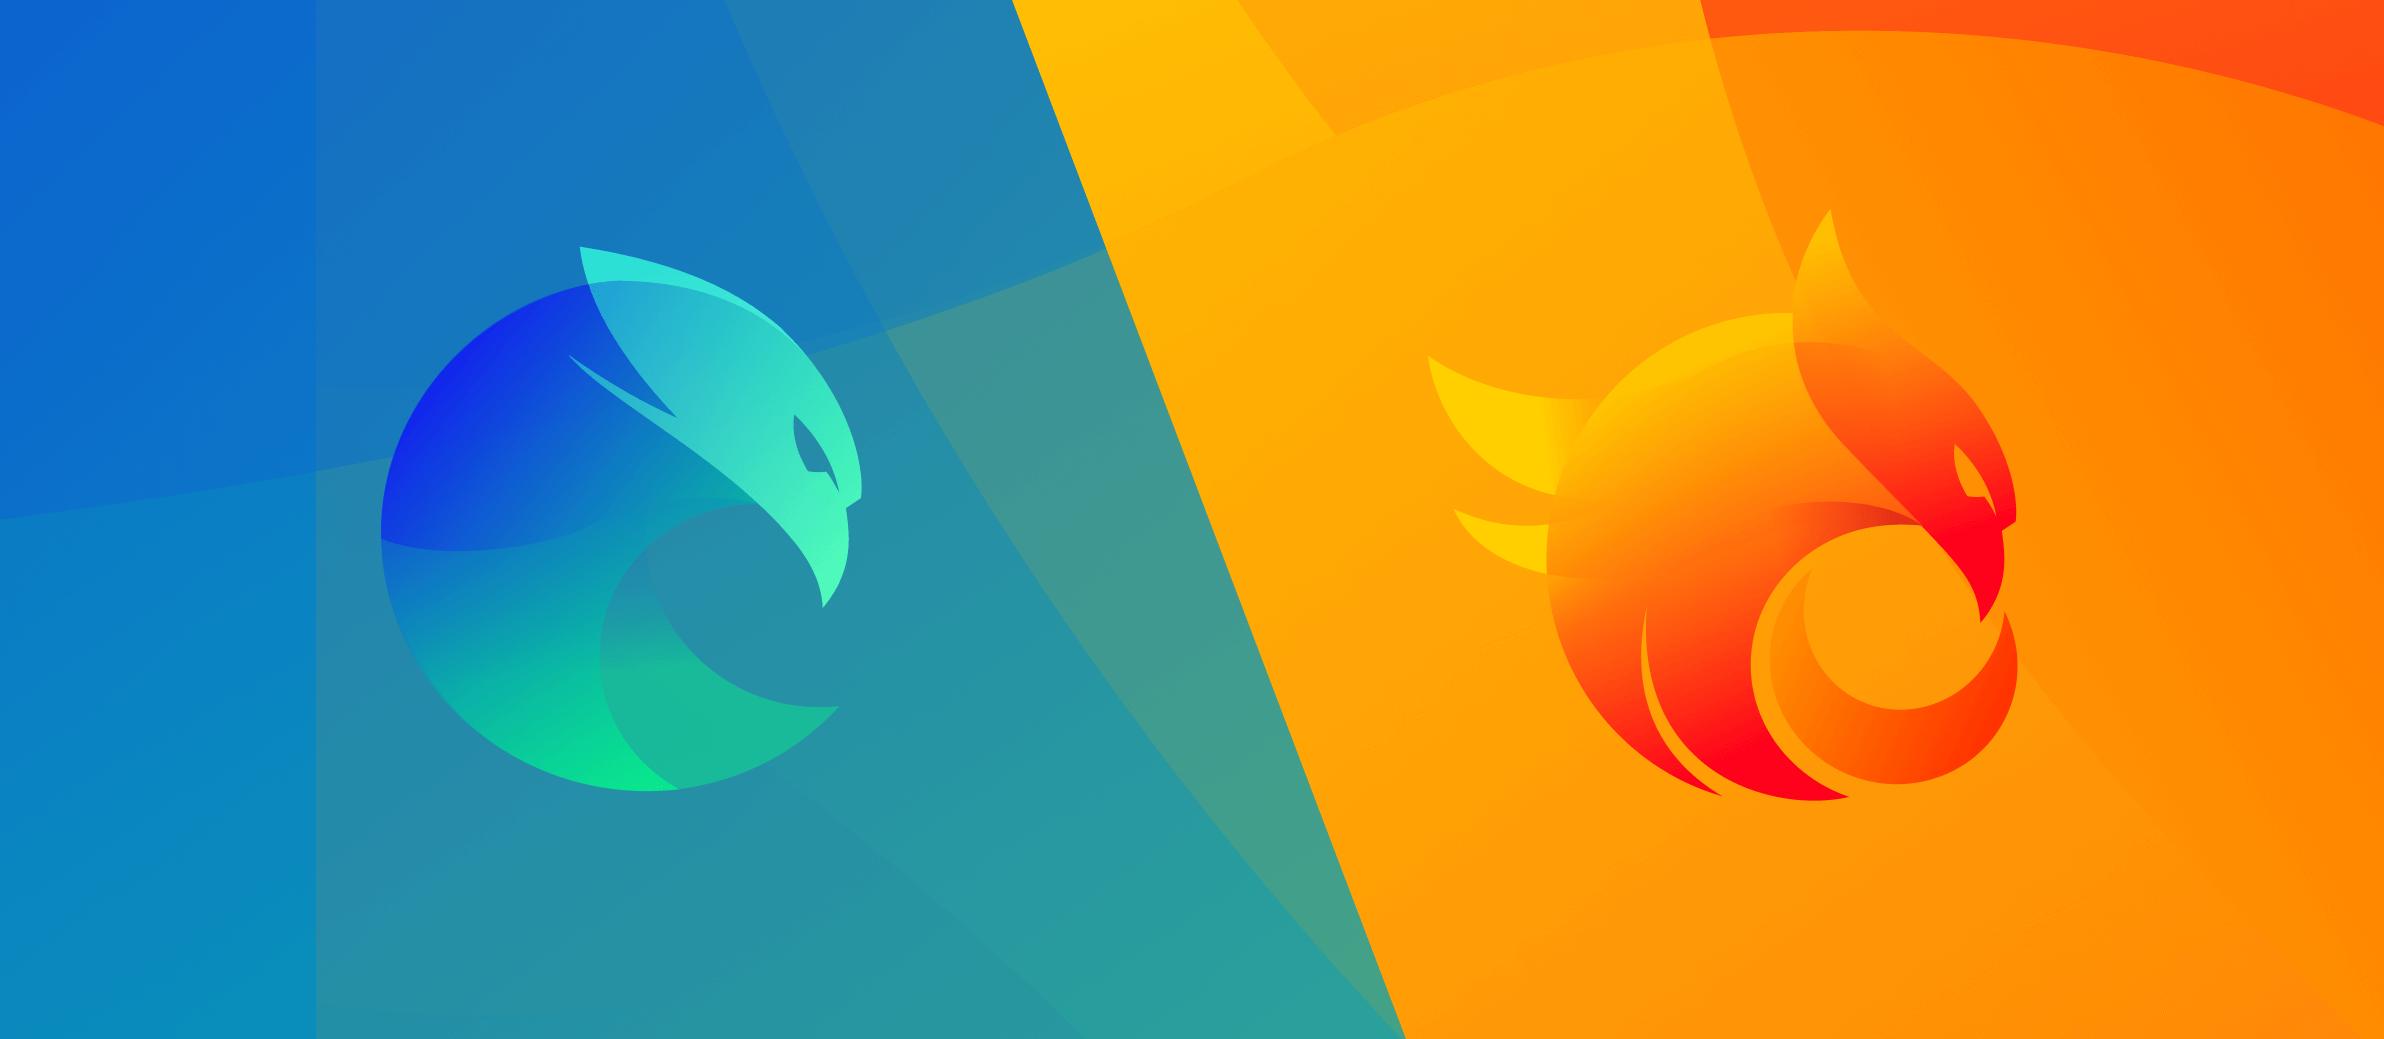 Introducing the Aragon Network DAO: Phoenix to Firebird